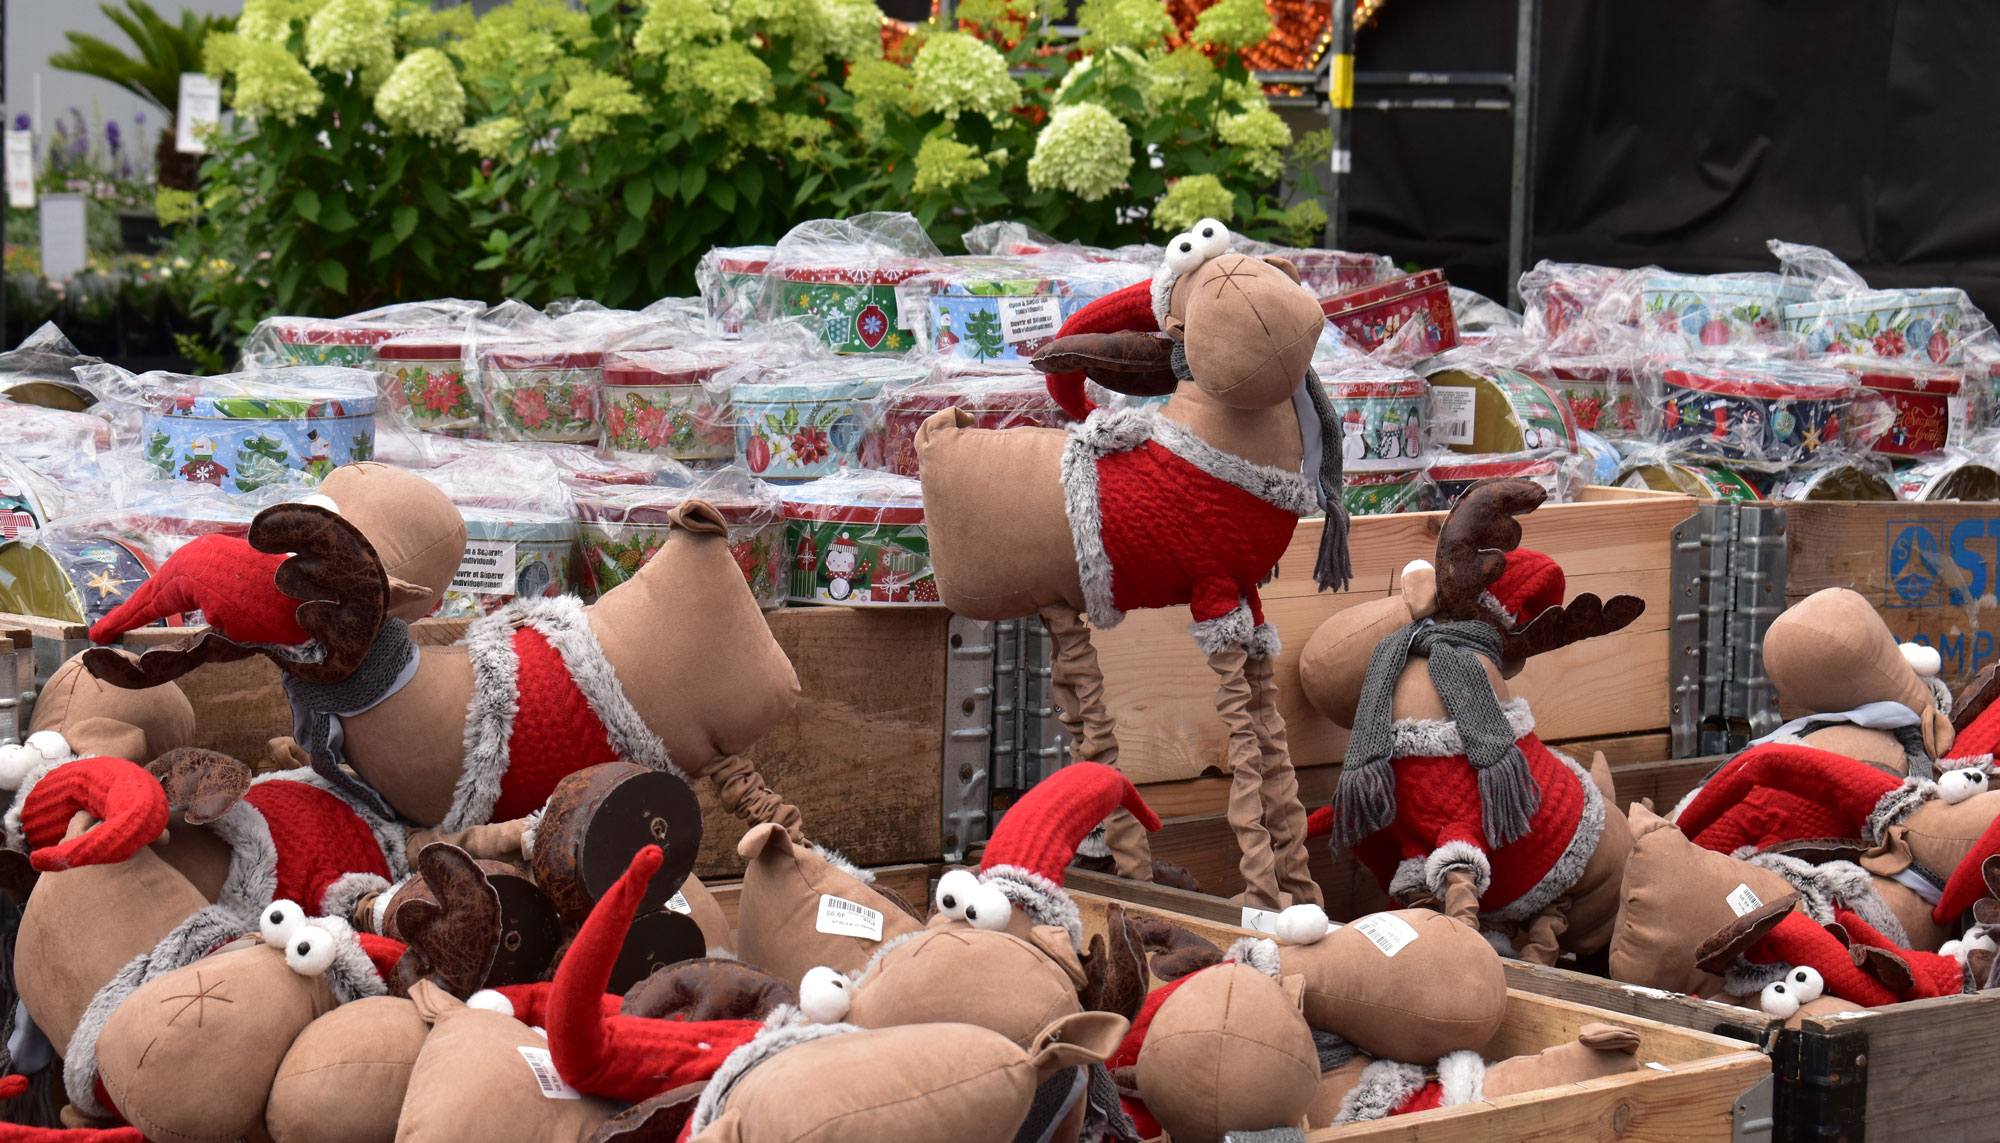 Lidt forsinket: Billigblomst har skudt julesalget i gang